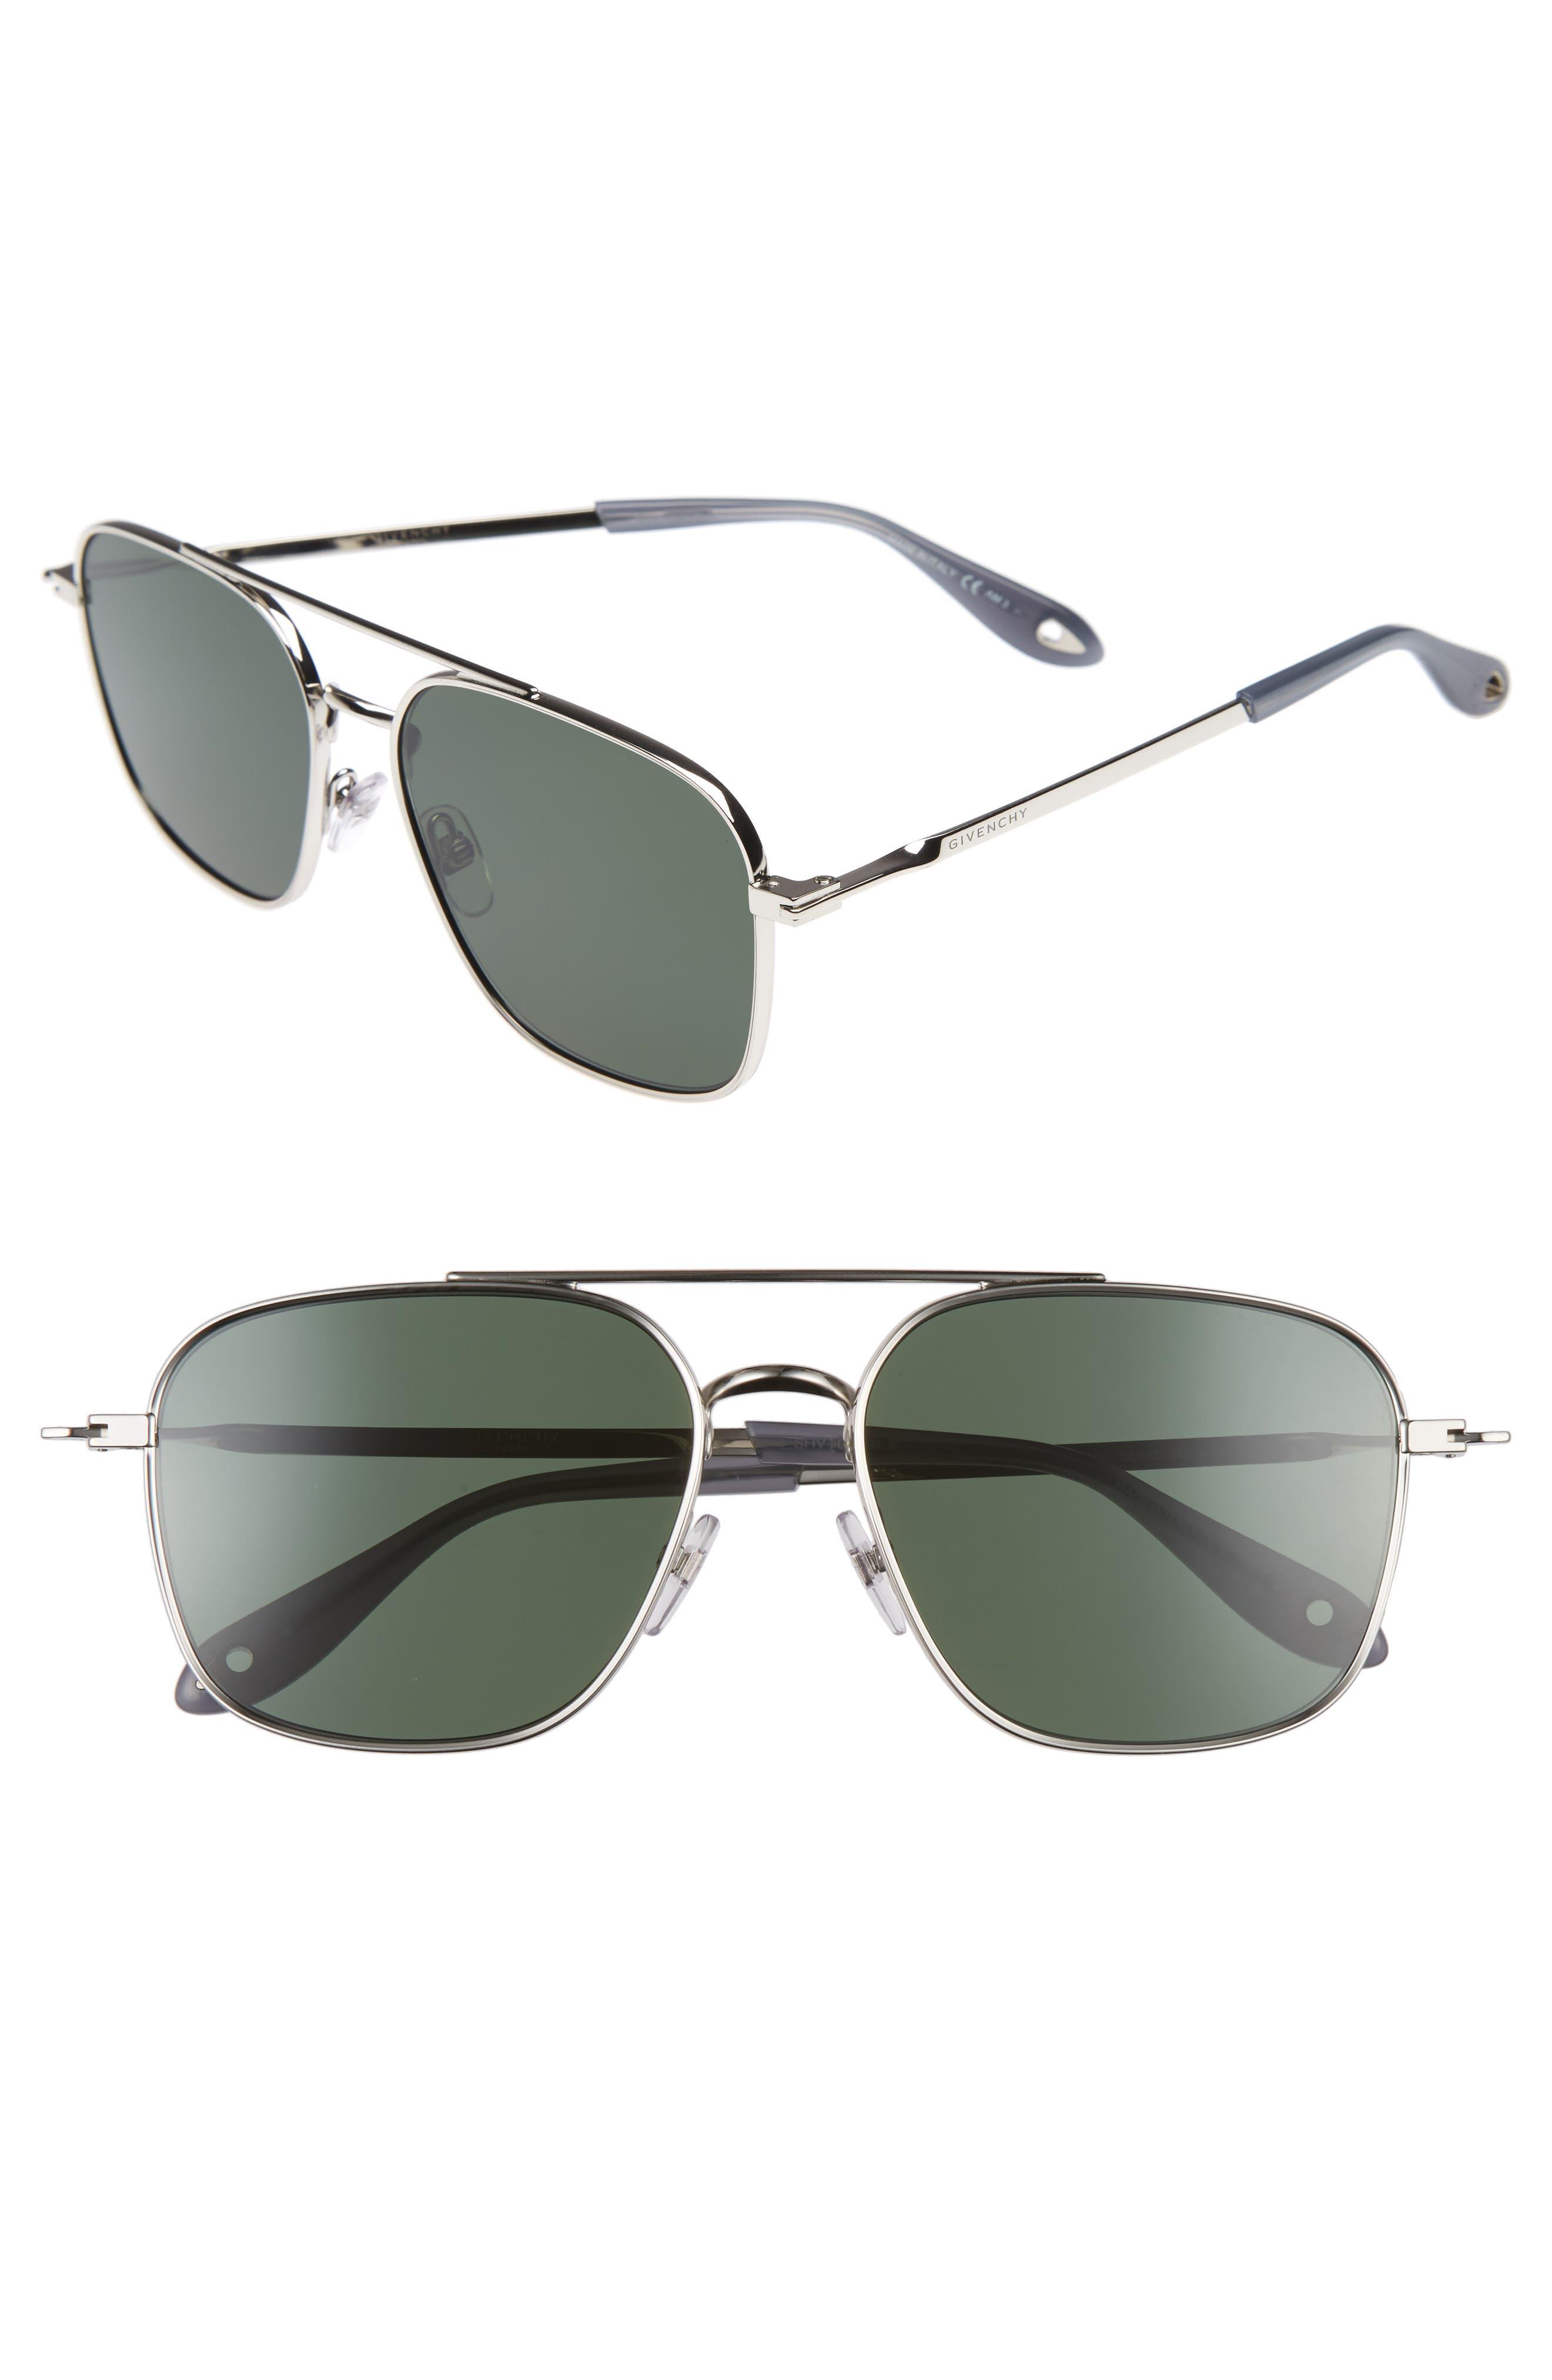 7033/S 58mm Sunglasses,                             Alternate thumbnail 2, color,                             041